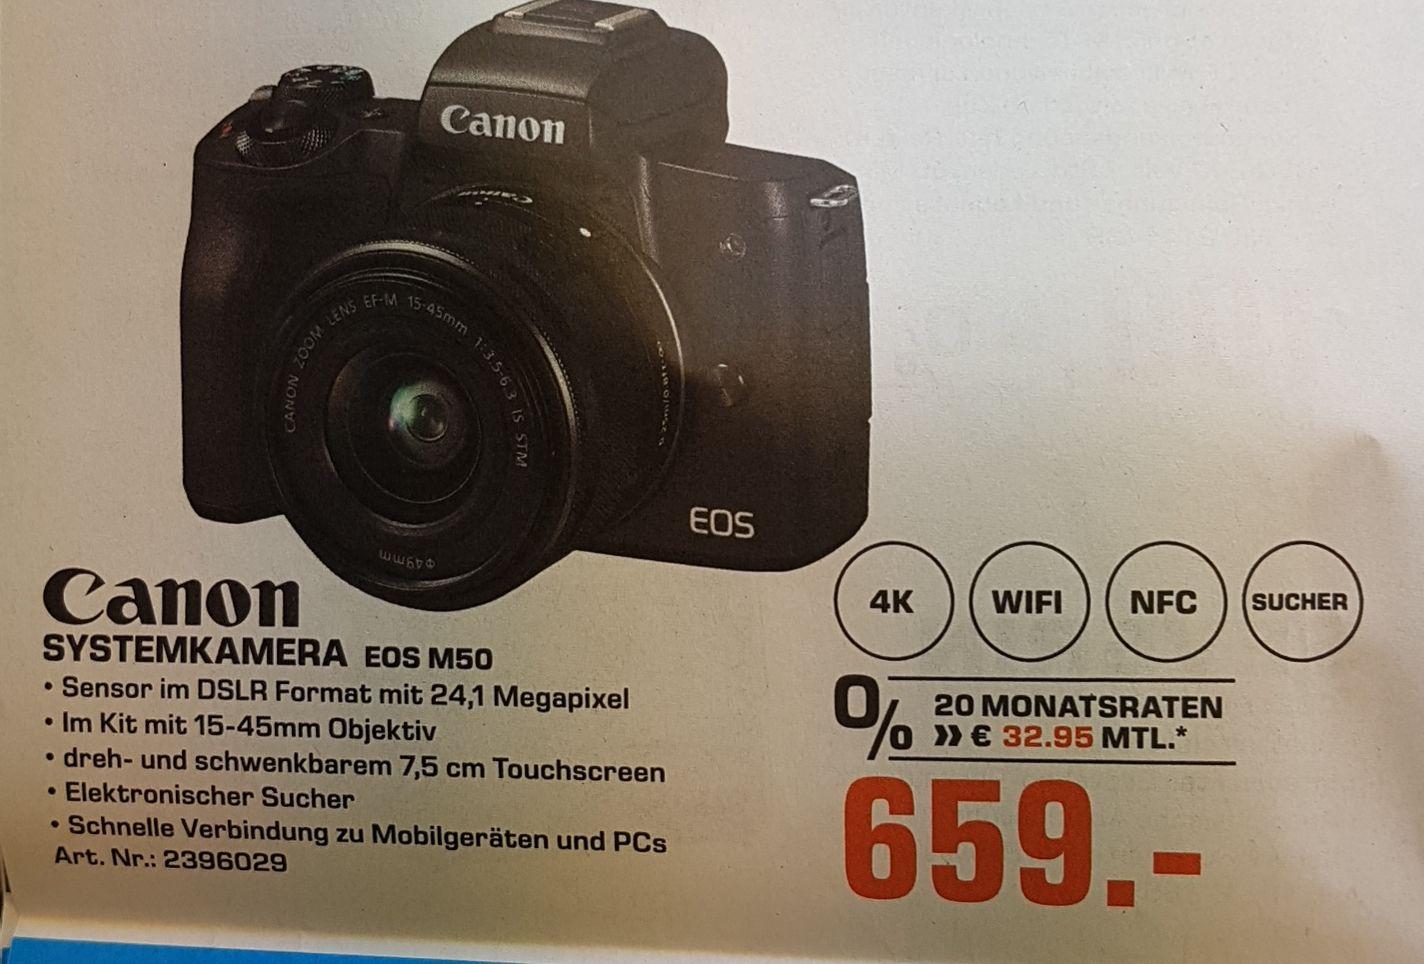 Berlin - Canon eos m50 mit 15-45mm